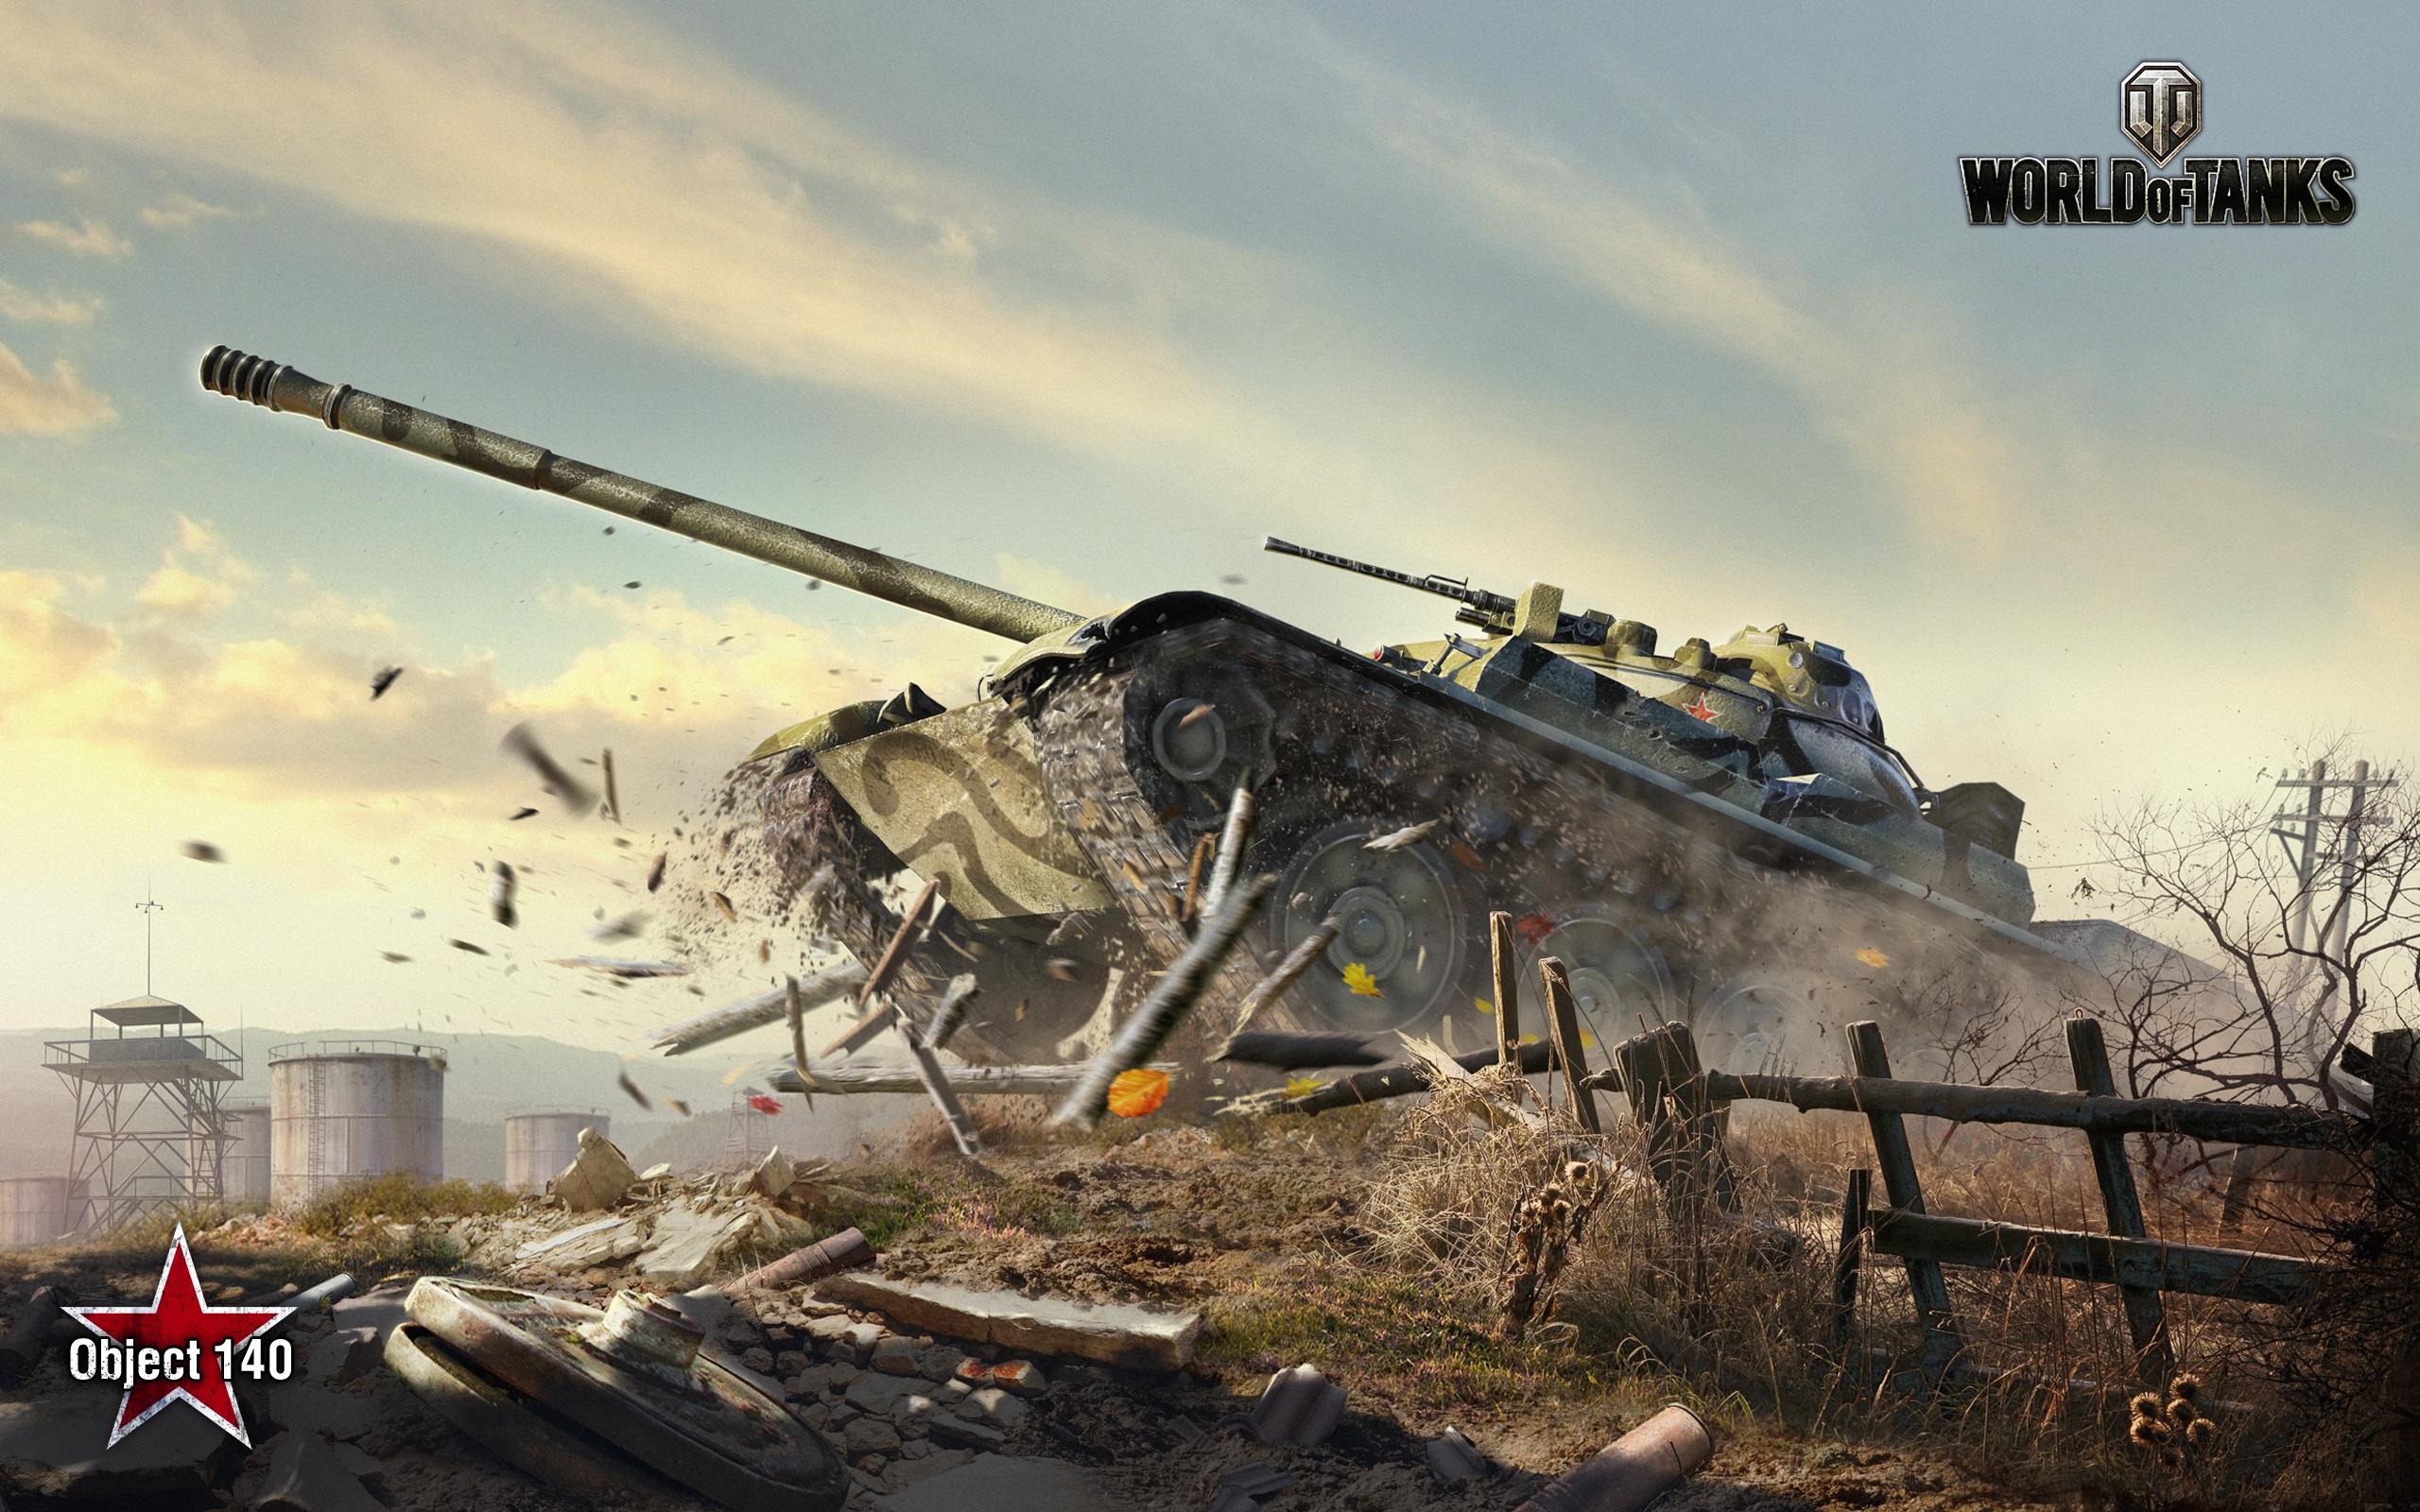 HD Wallpapers Obj 140 World of Tanks